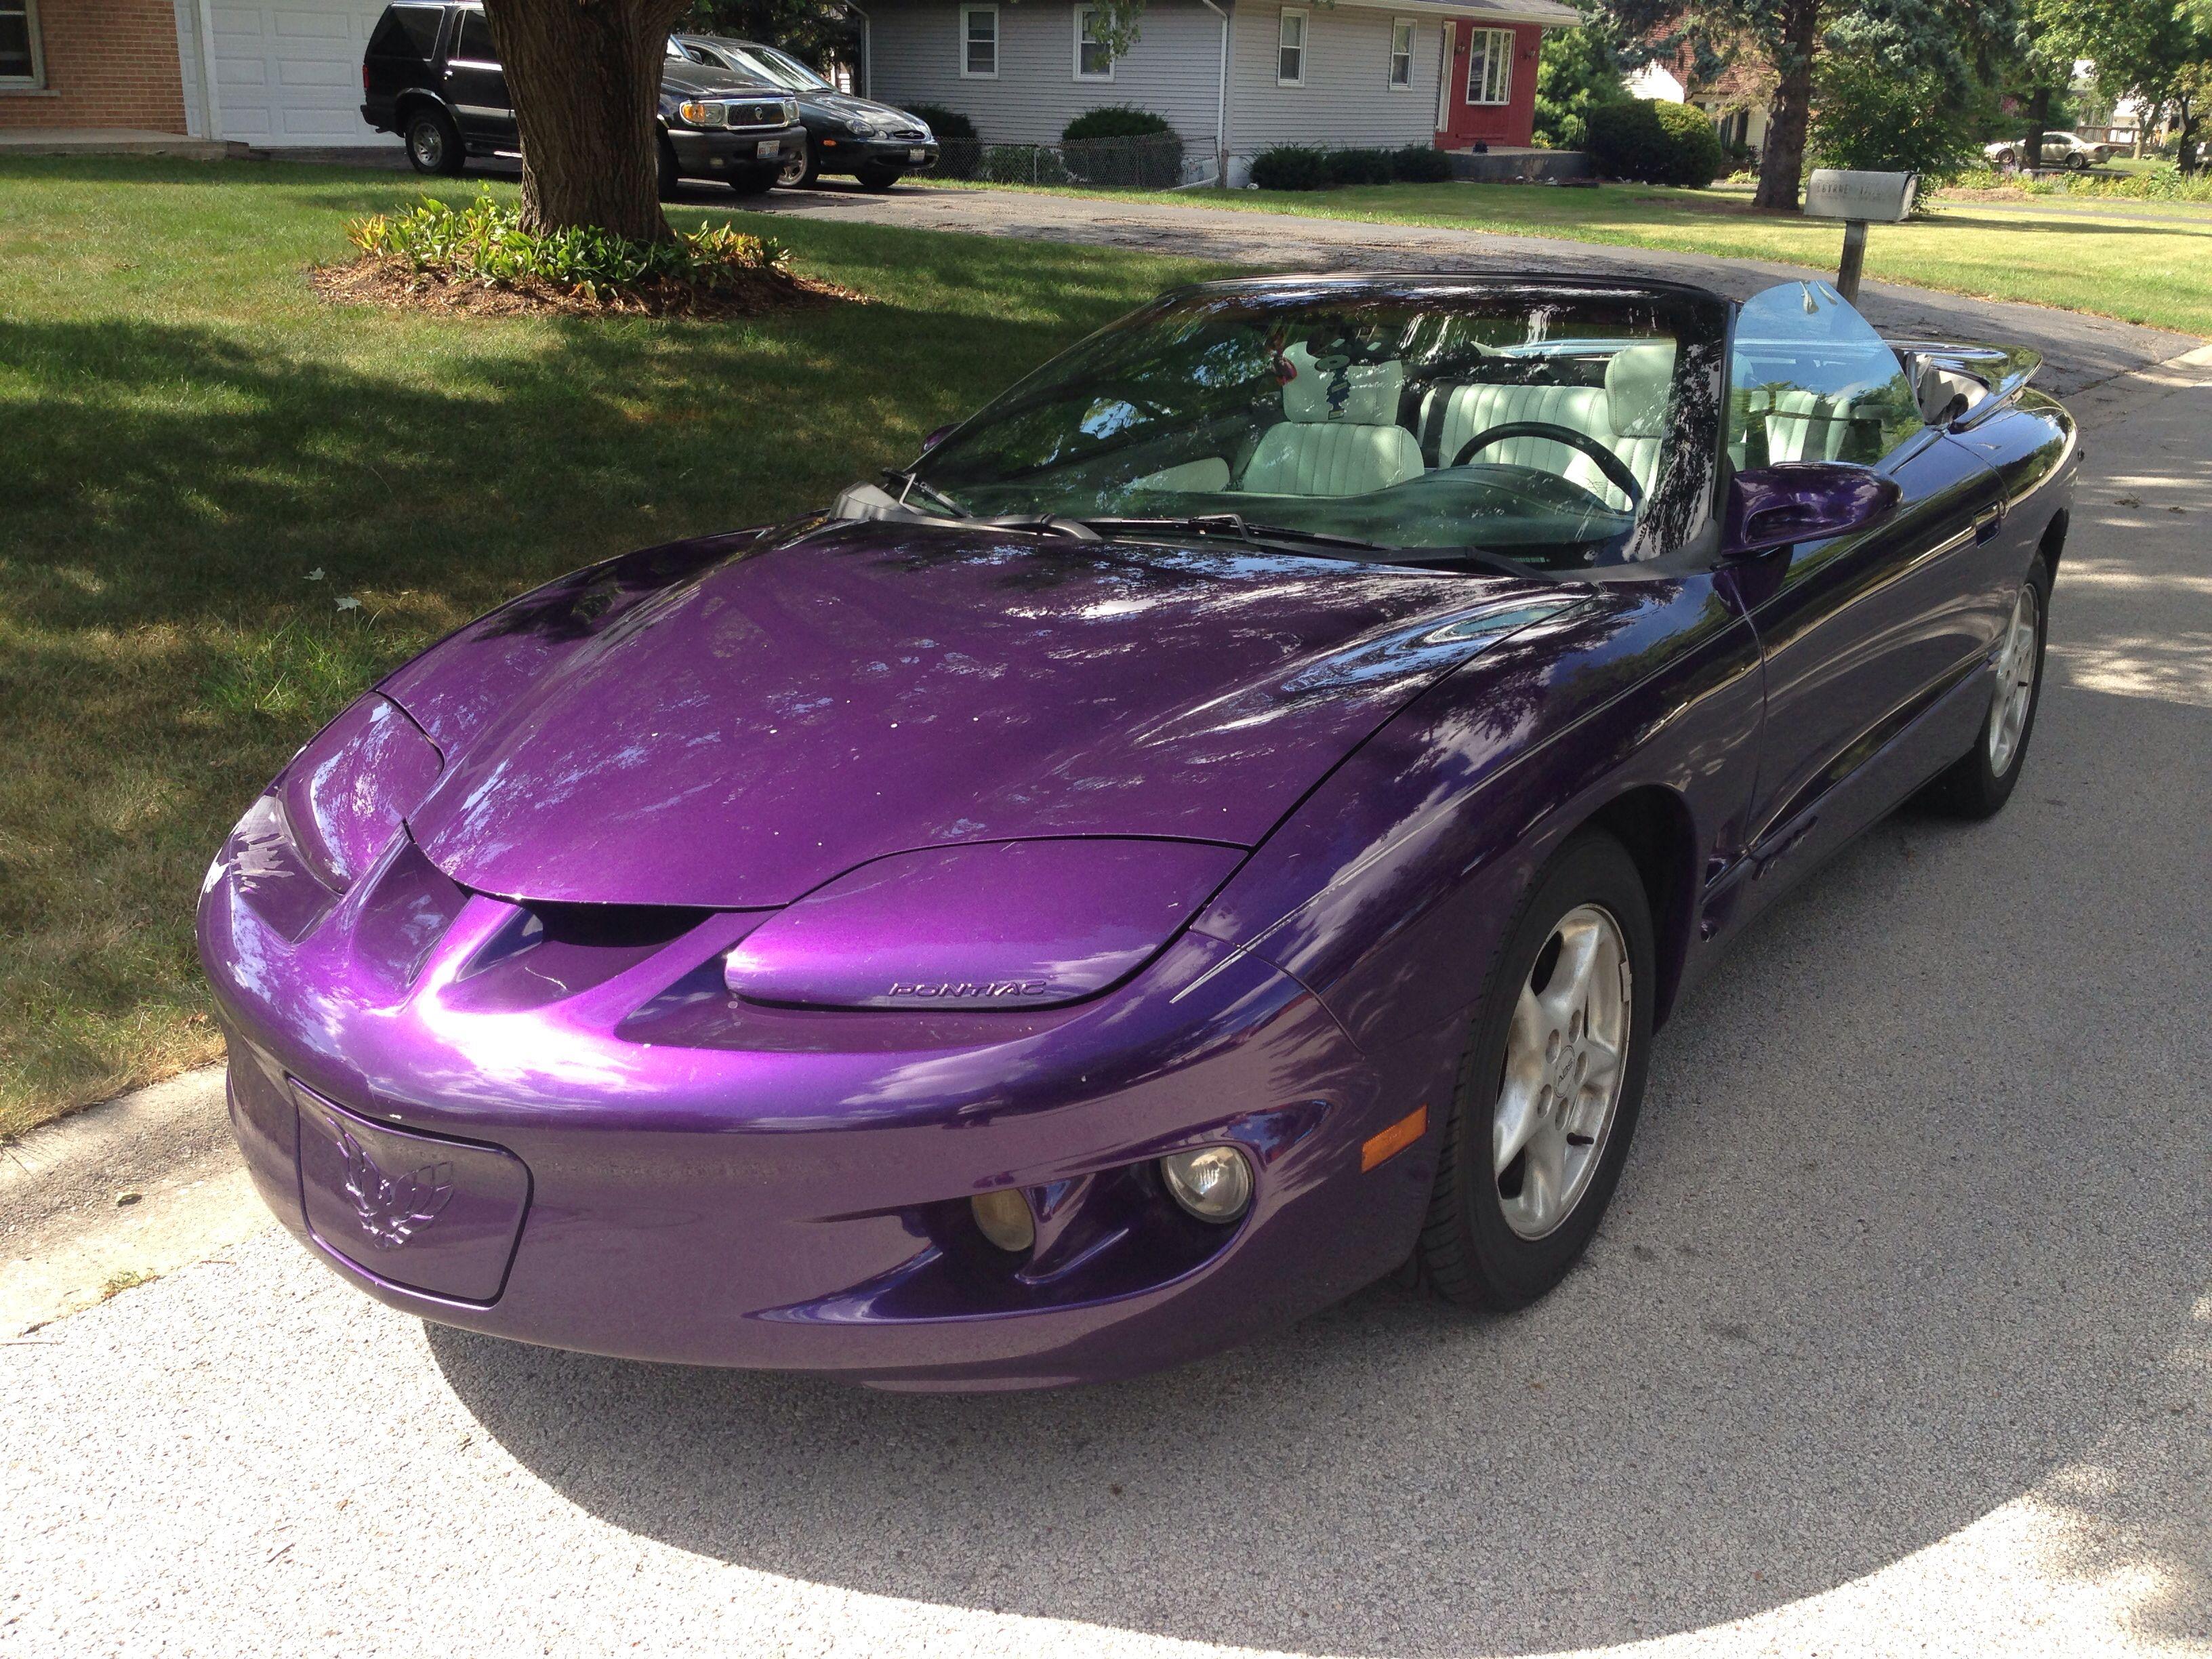 my 1998 pontiac firebird pontiac firebird pontiac car my 1998 pontiac firebird pontiac